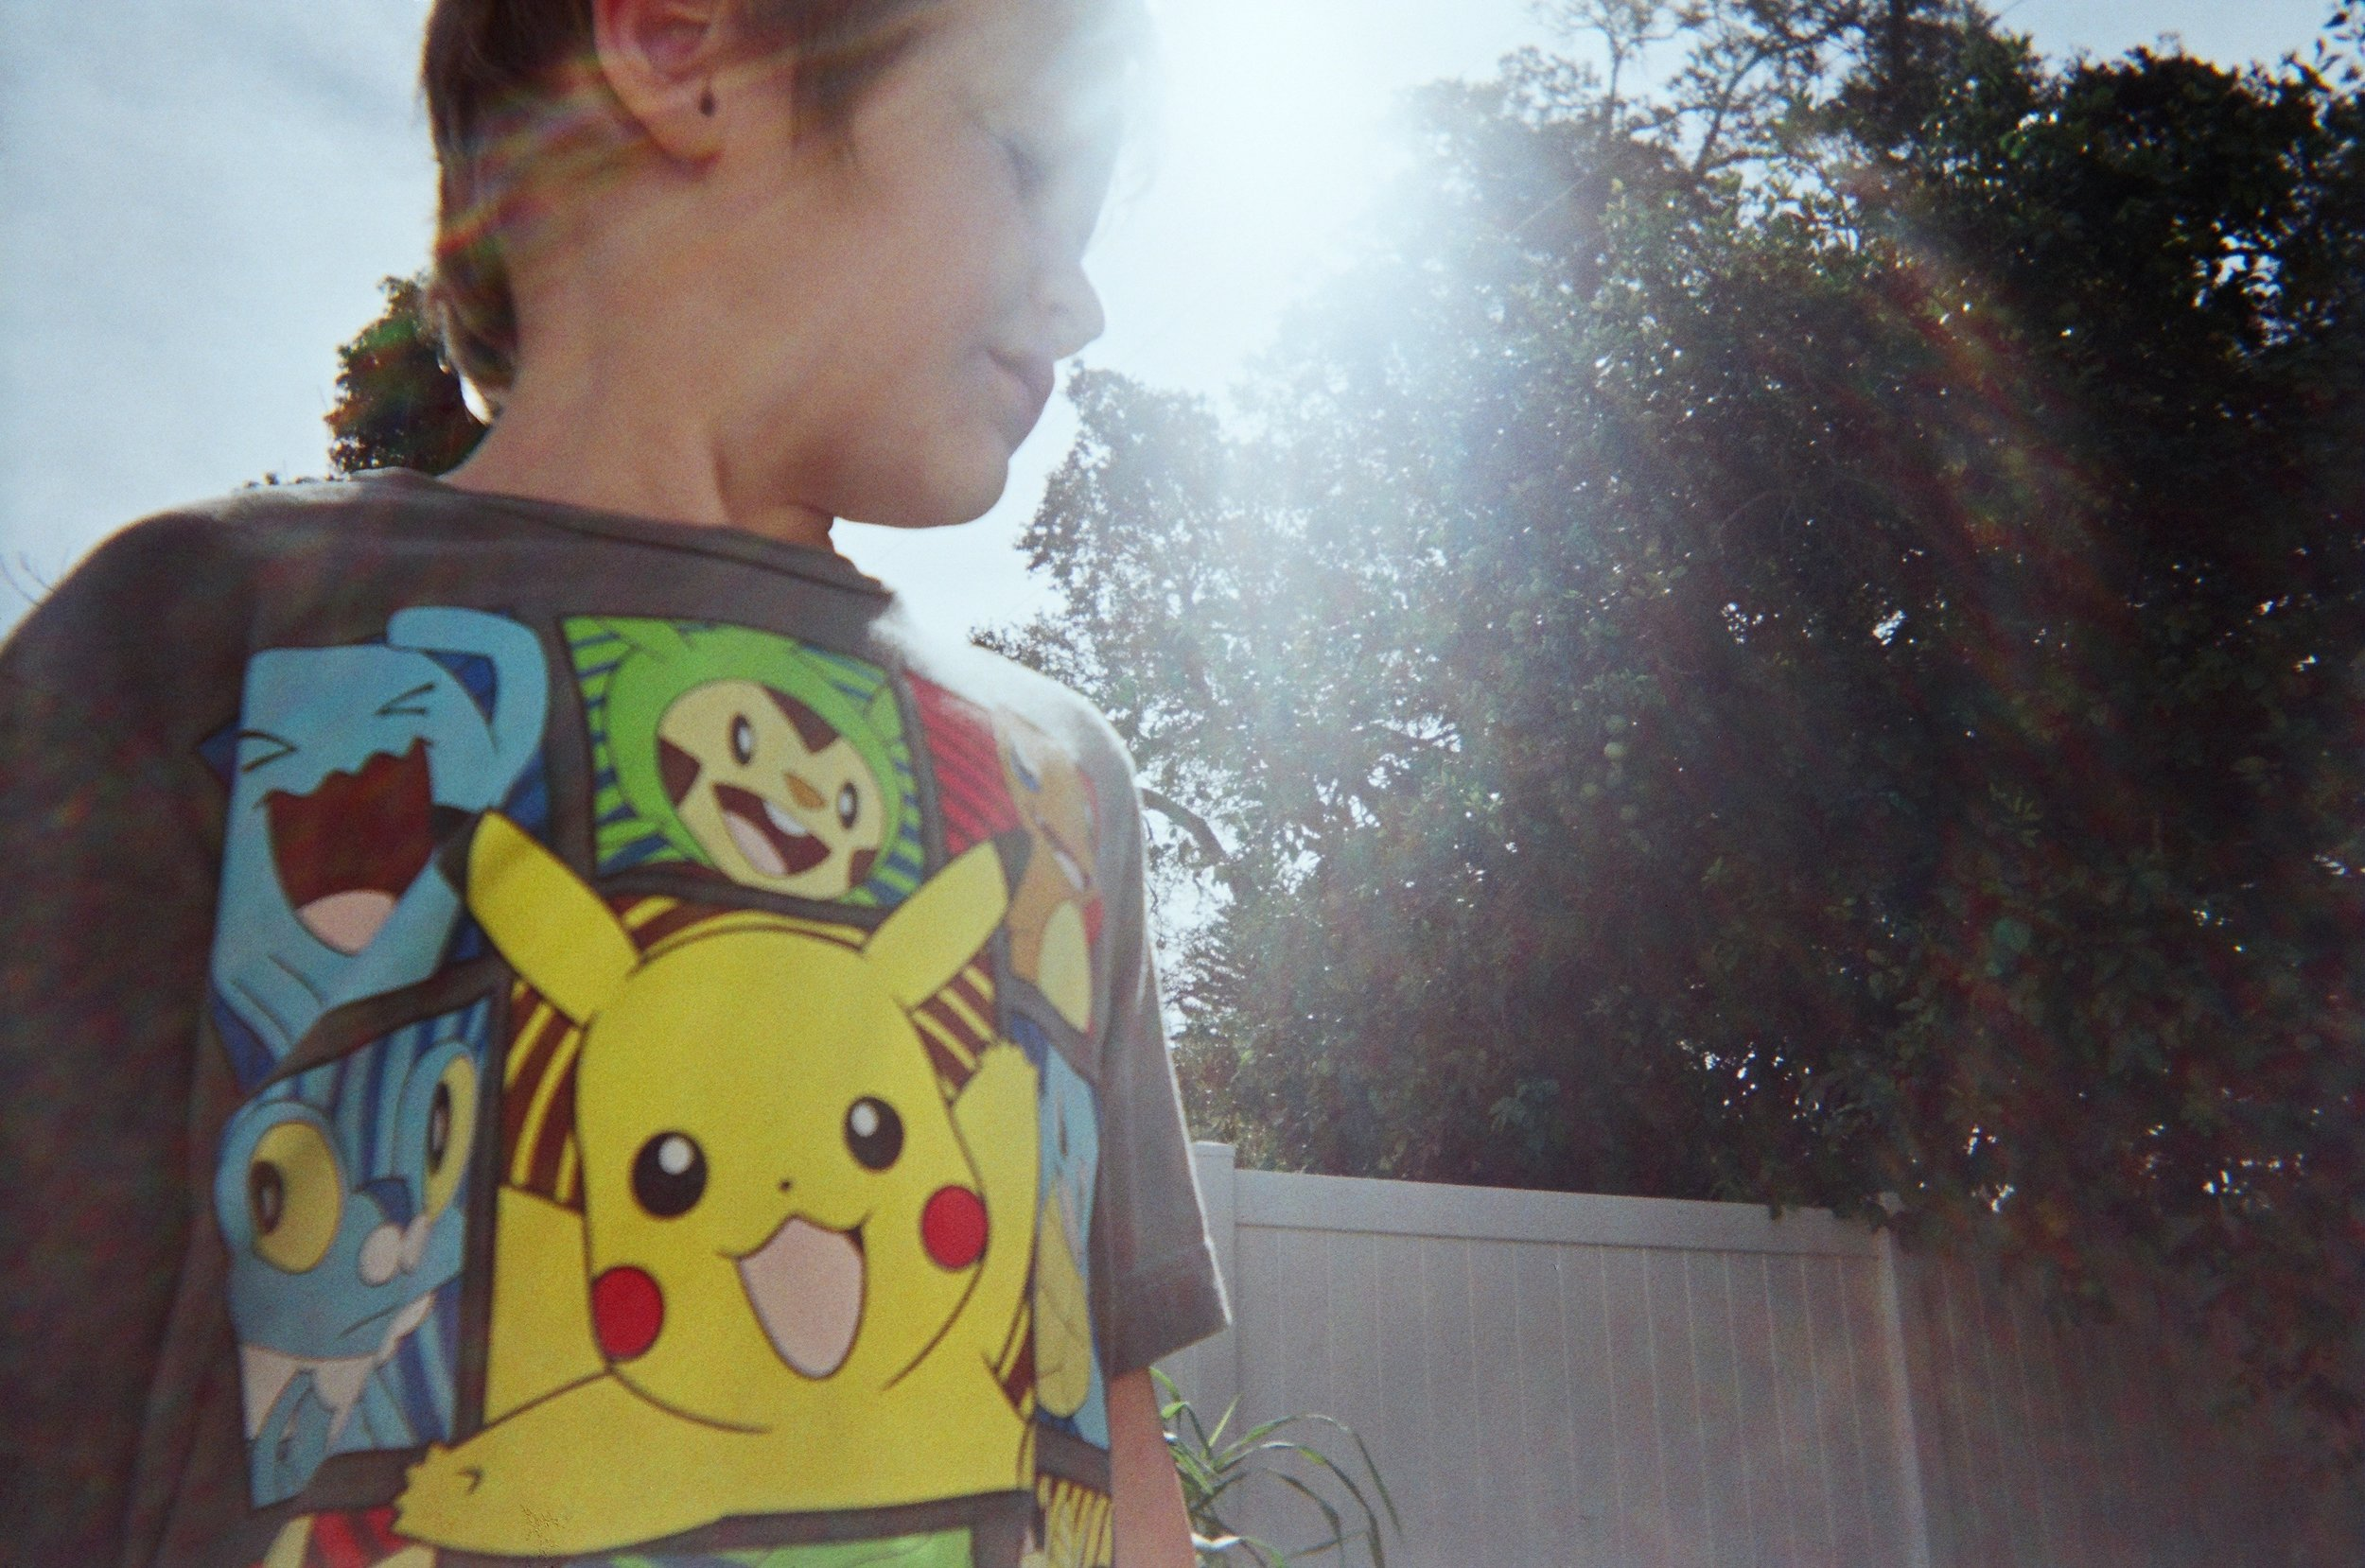 boy-in-pokemon-shirt-with-sun-beams.jpg